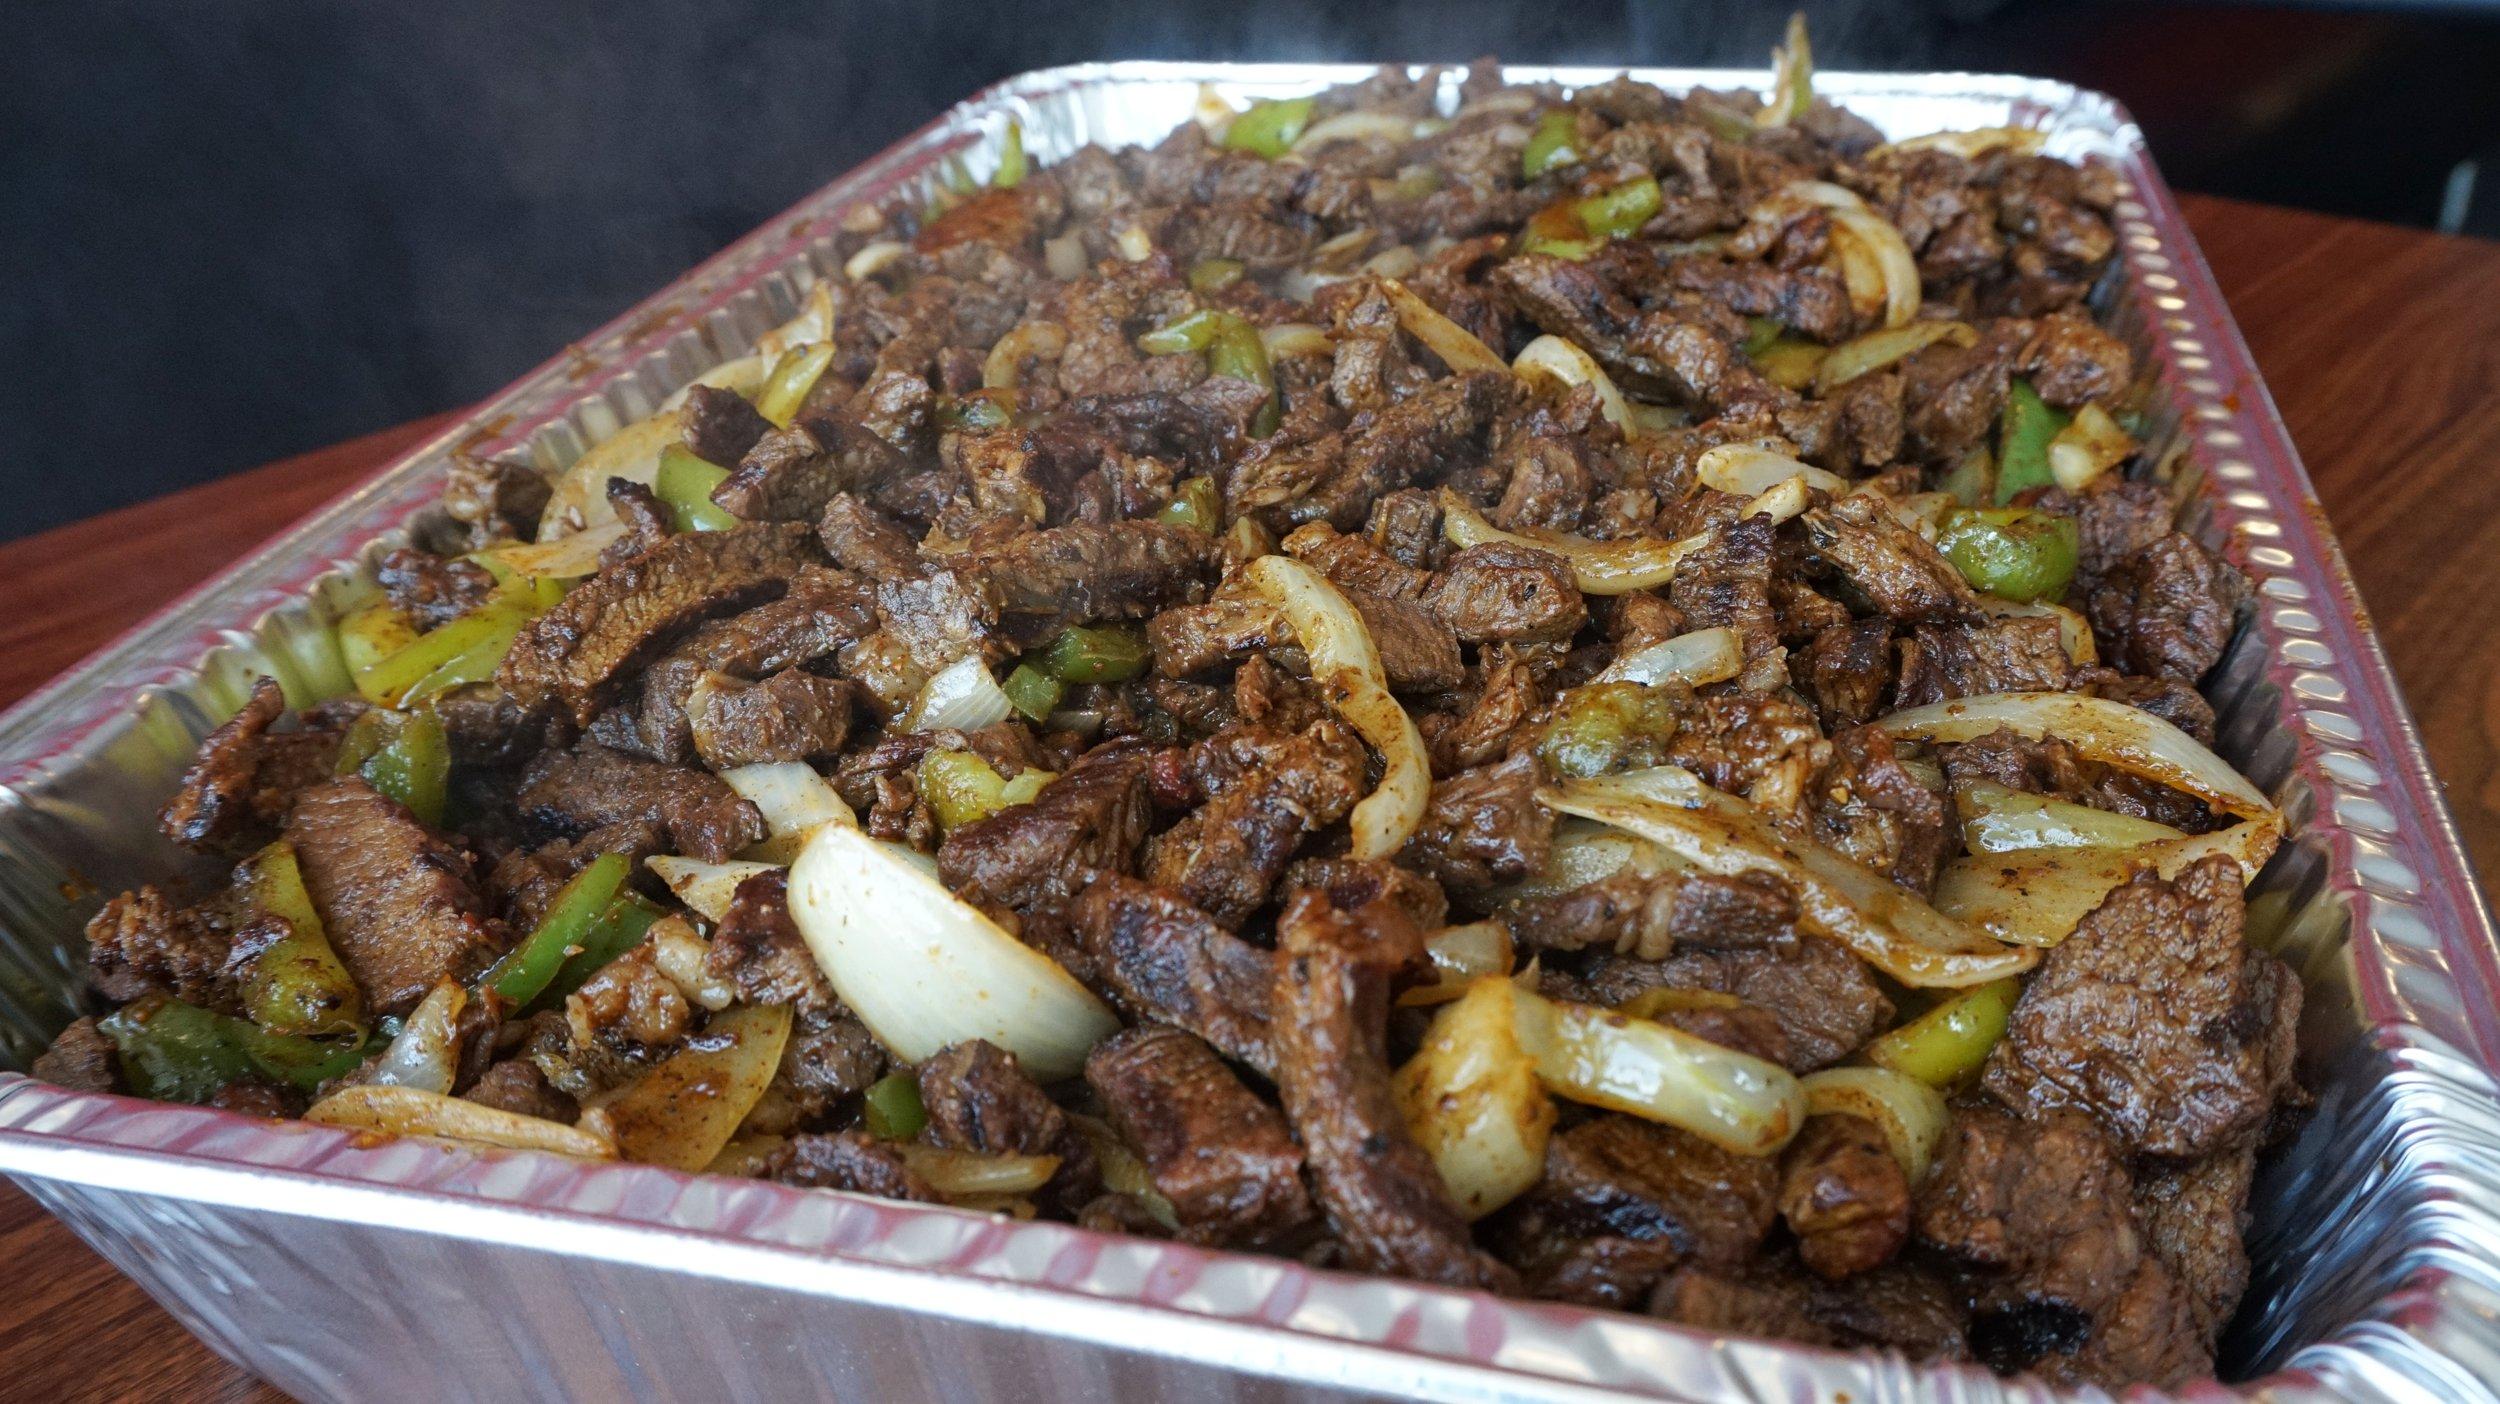 Large Tray of Steak Fajitas